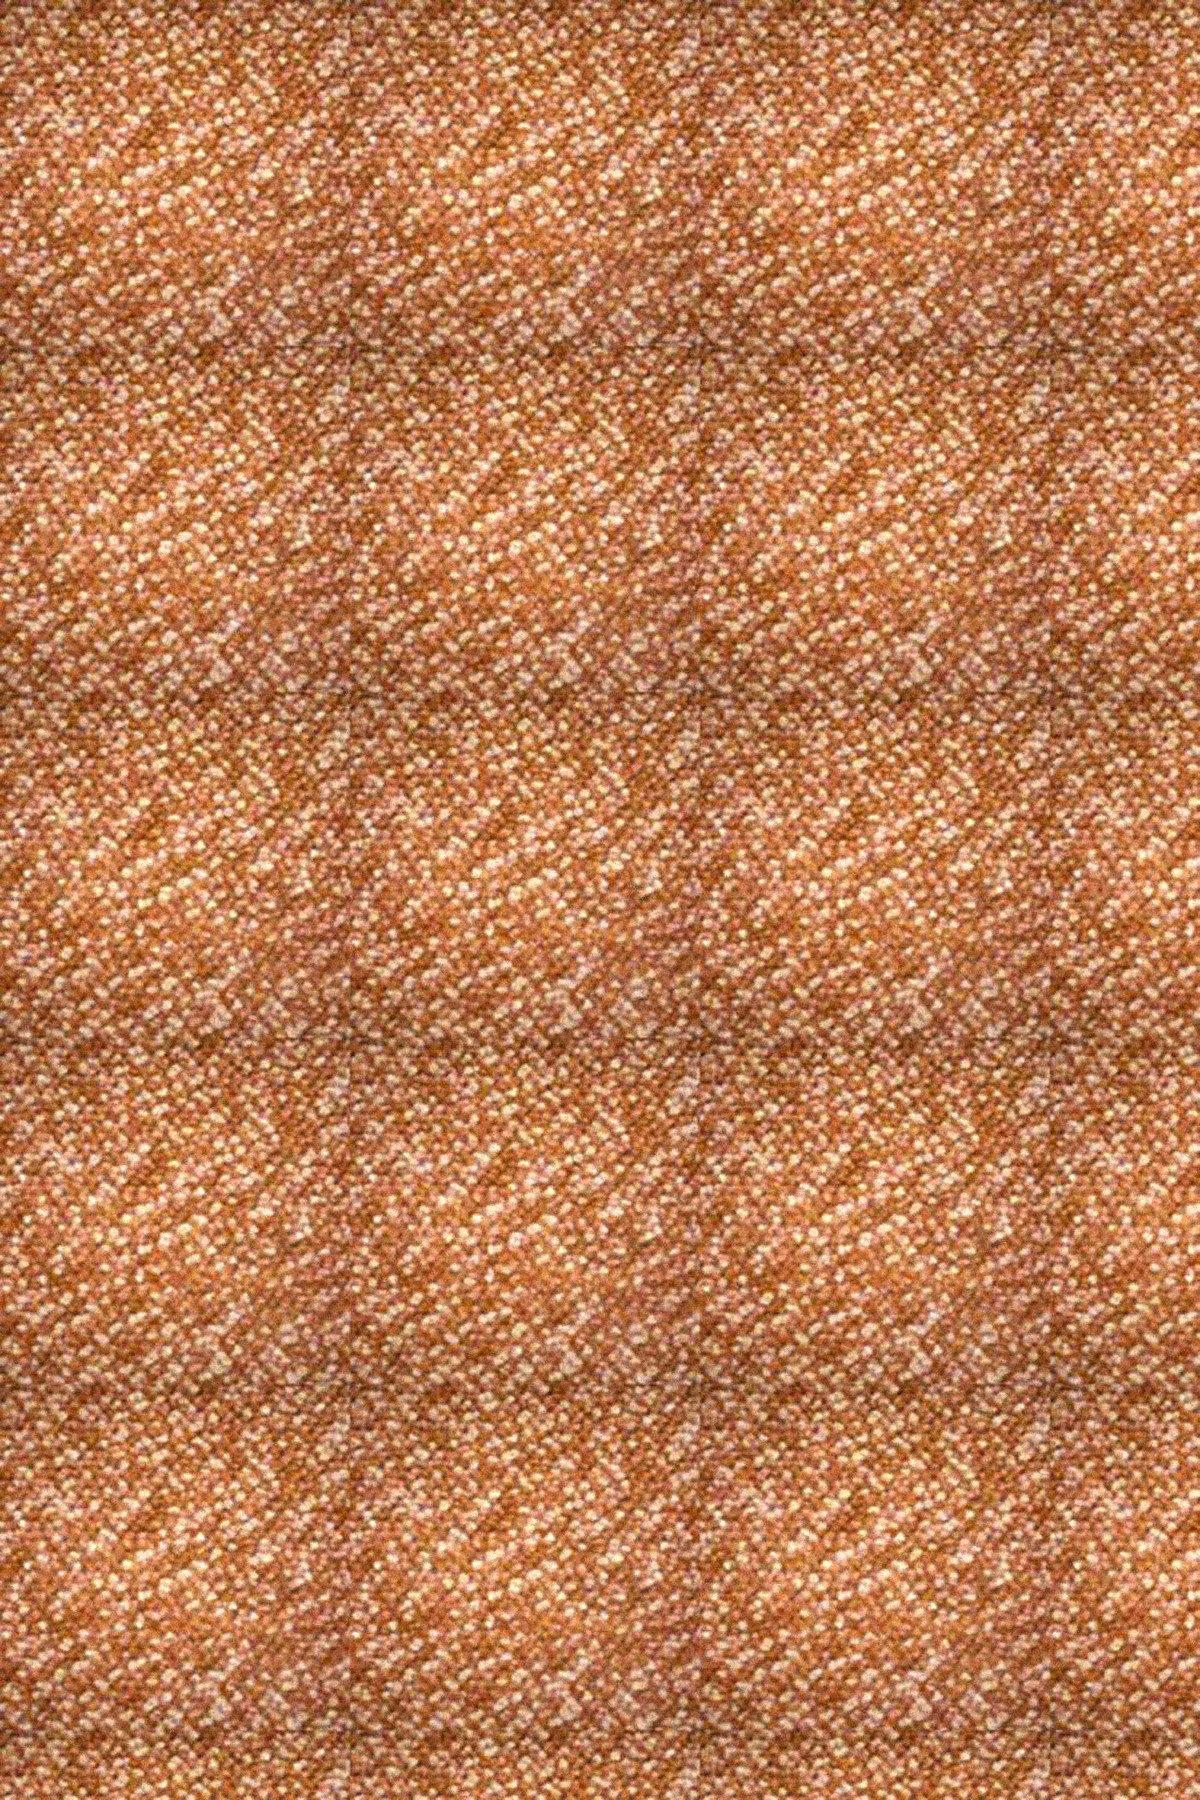 Surya Confetti CONFETT-10 (Burnt Orange, Peach)